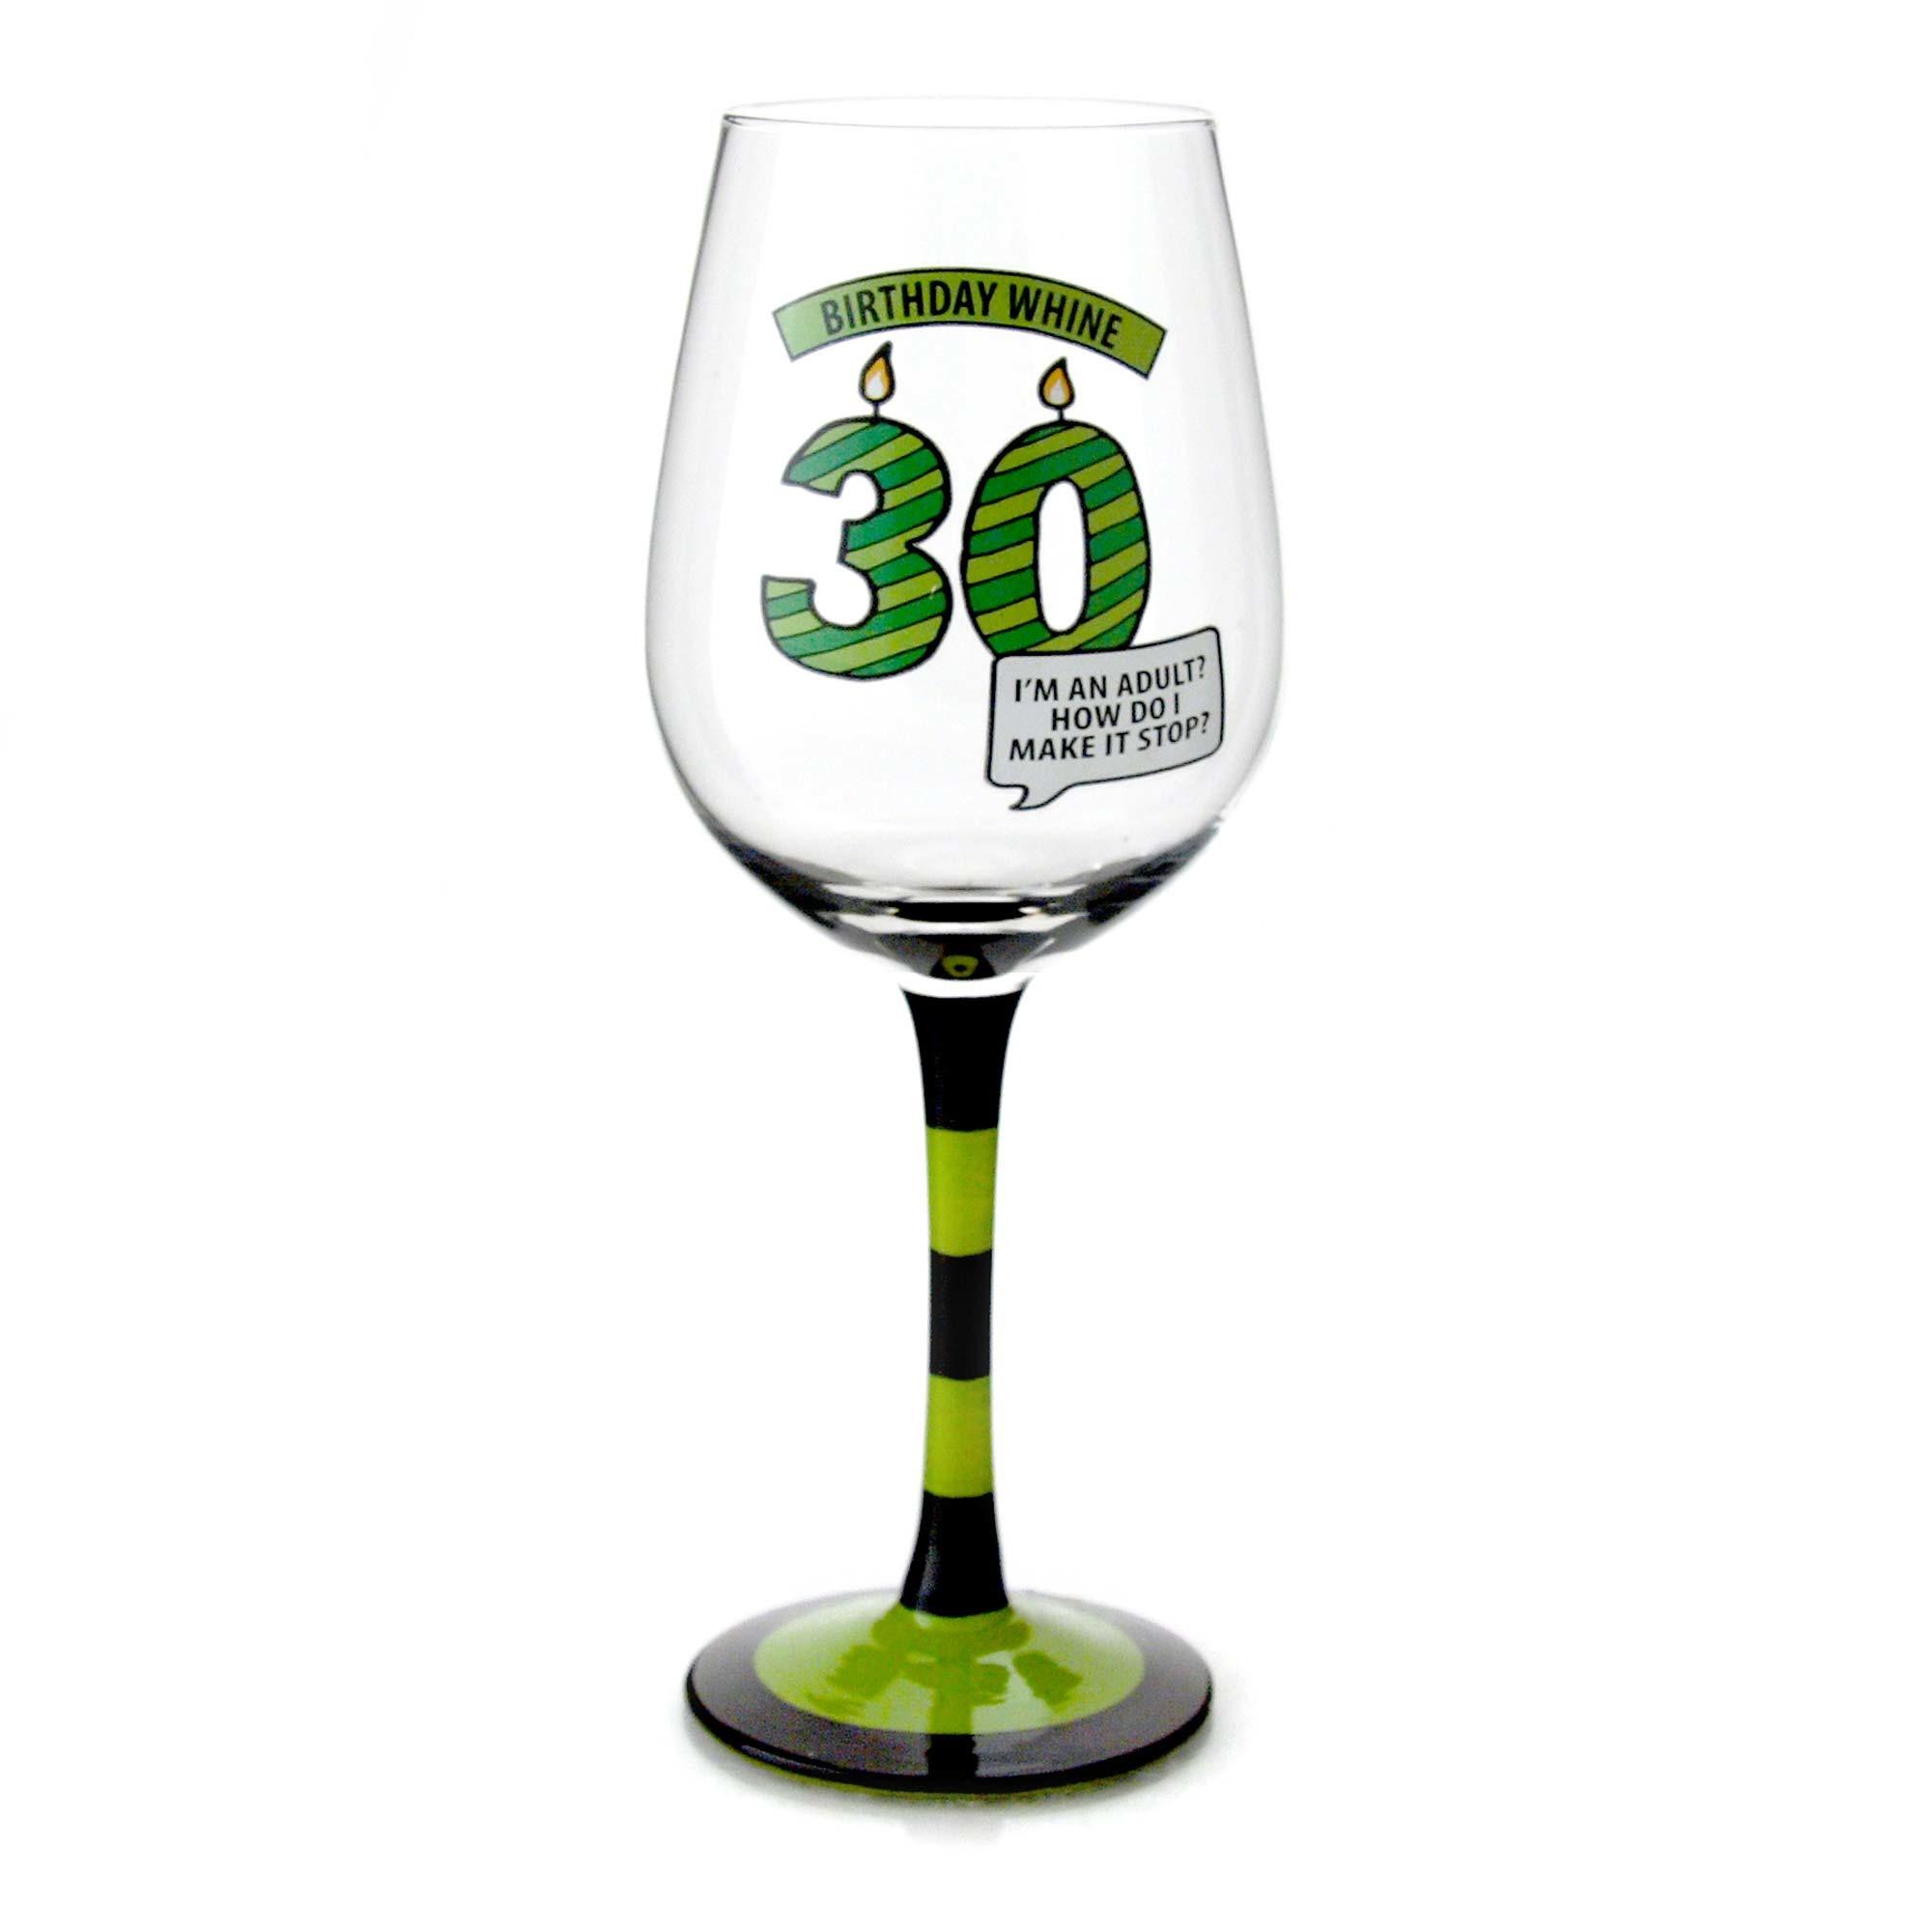 Goblet 30 - 30th Birthday Wine Glass